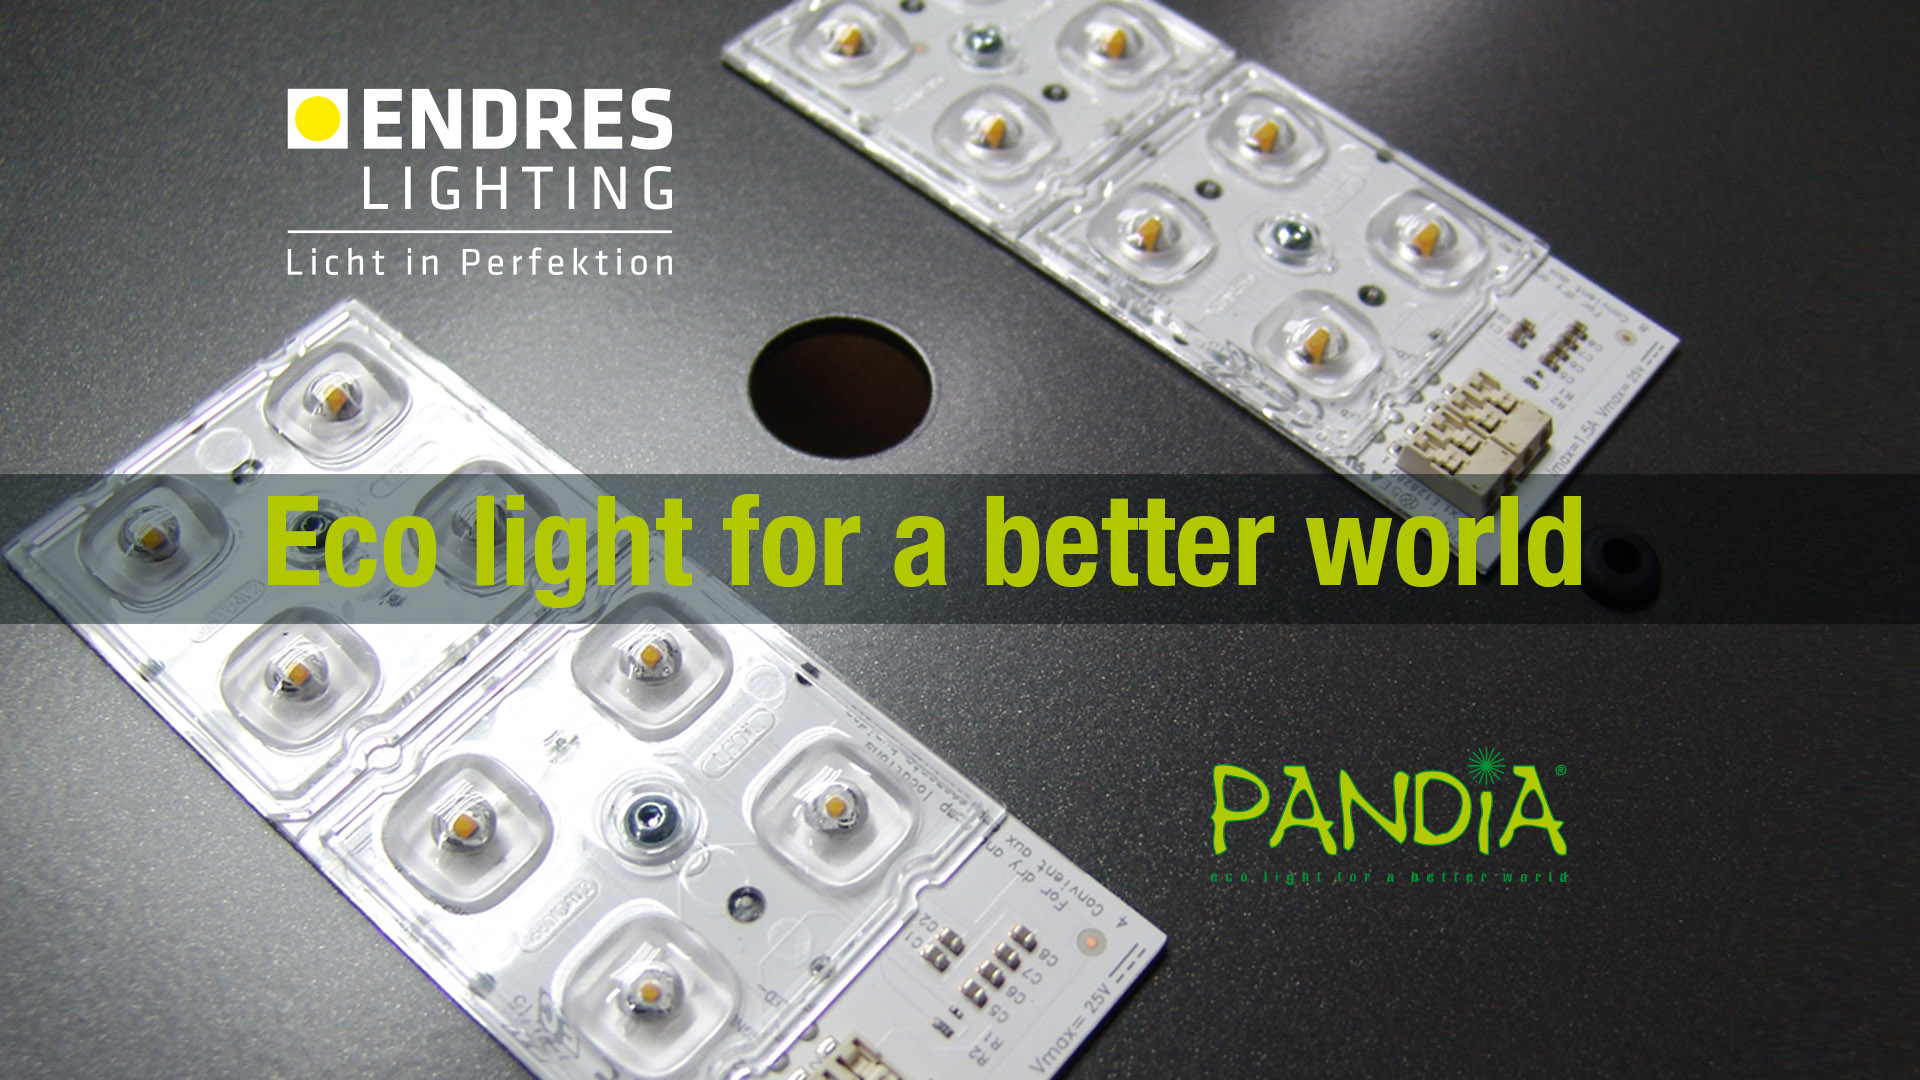 Eco light for a better world